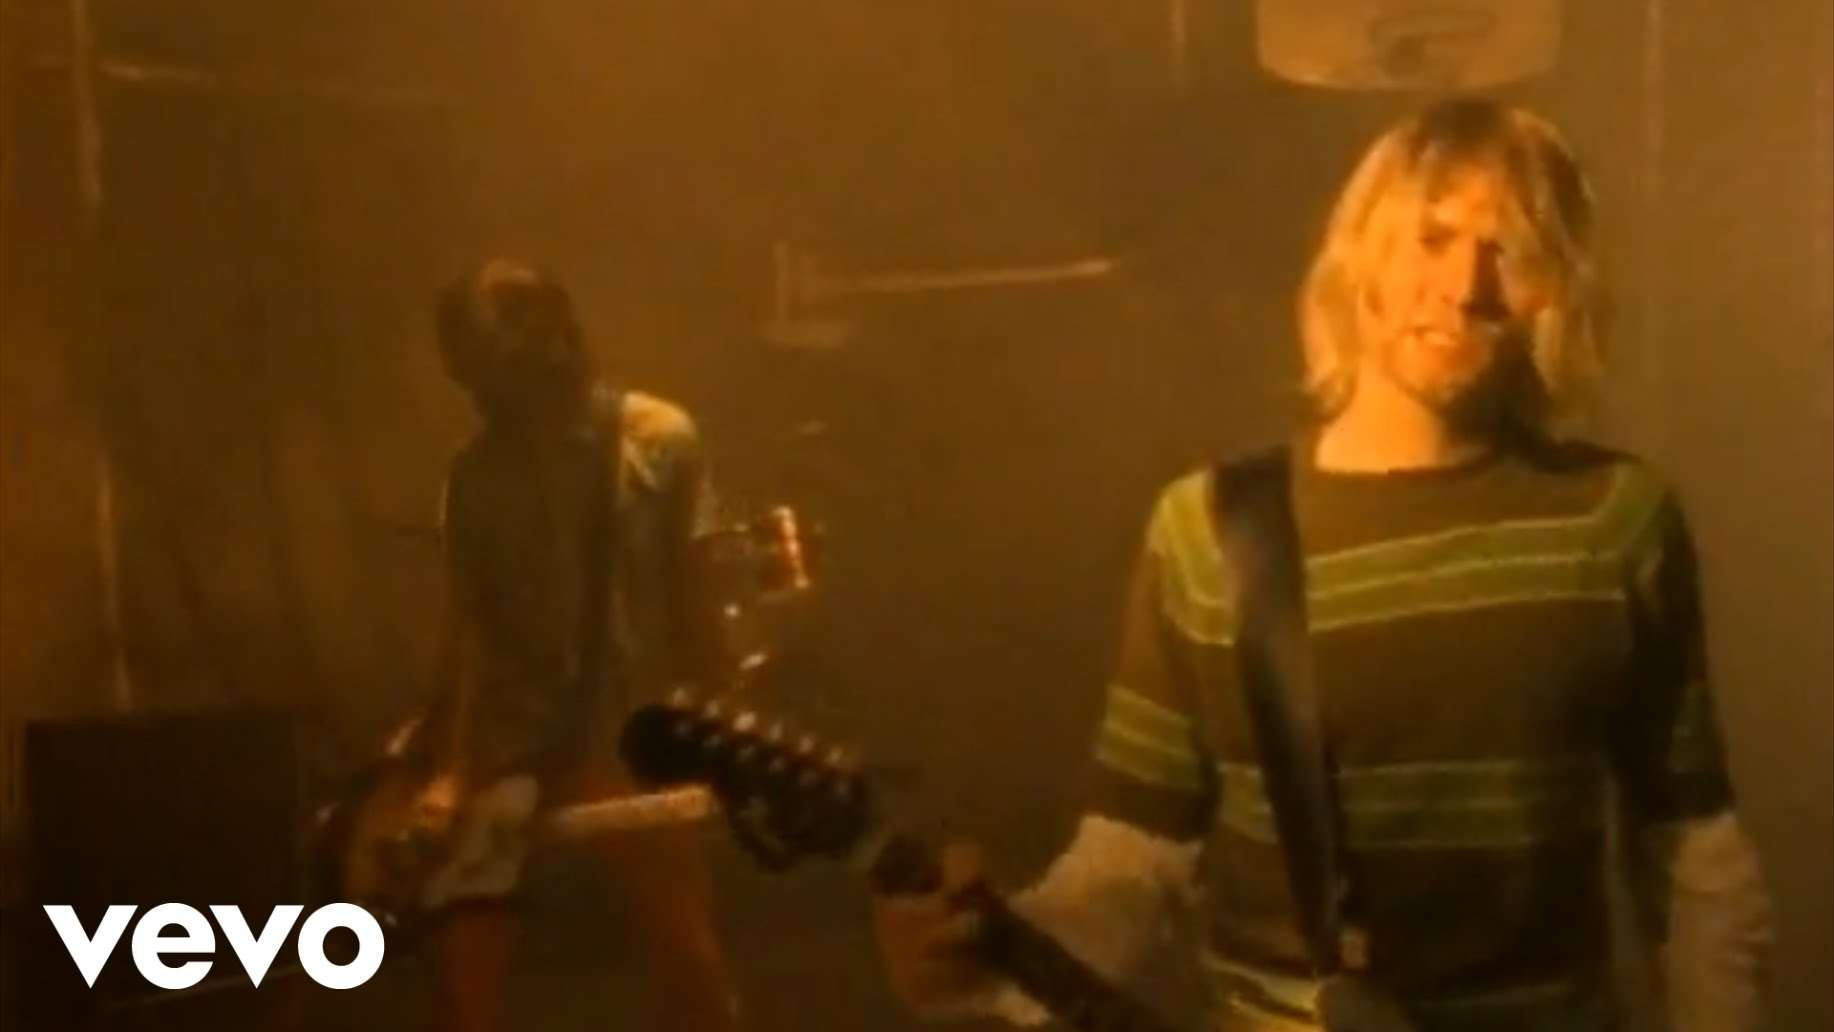 Nirvana - Smells Like Teen Spirit - YouTube